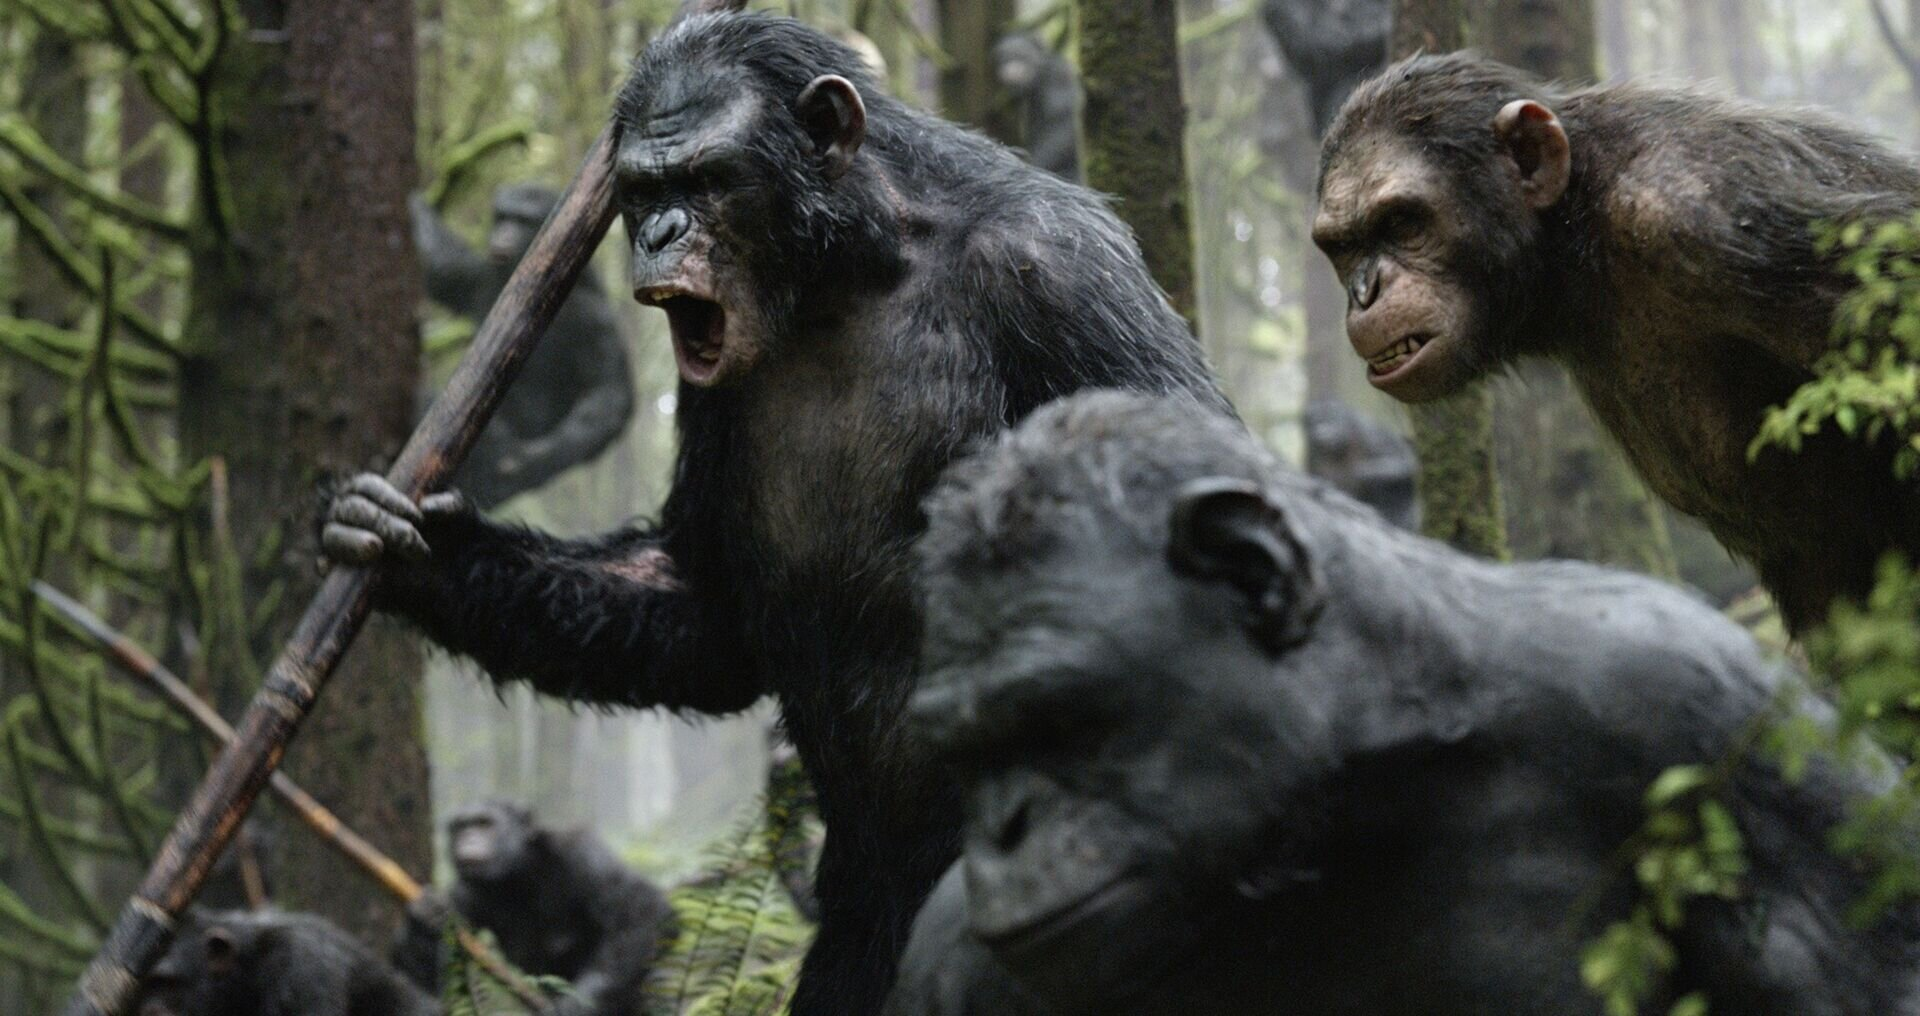 Картинка планета обезьян революция